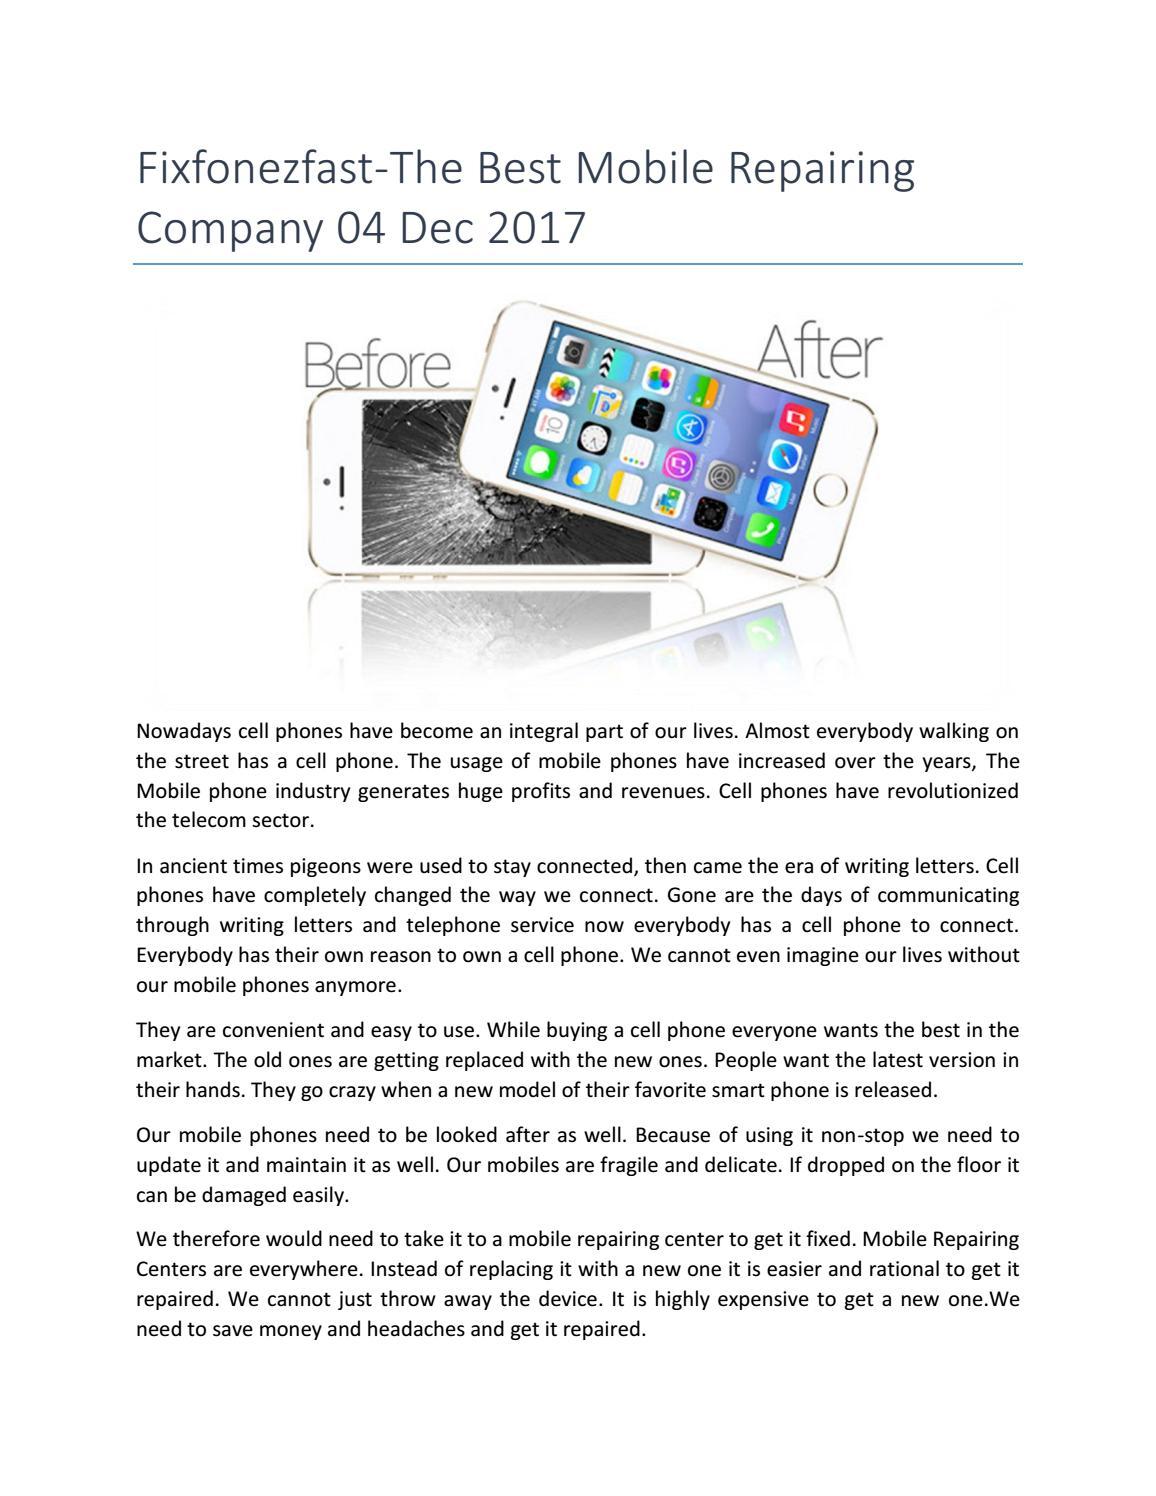 Fixfonezfast the best mobile repairing company 04 dec 2017